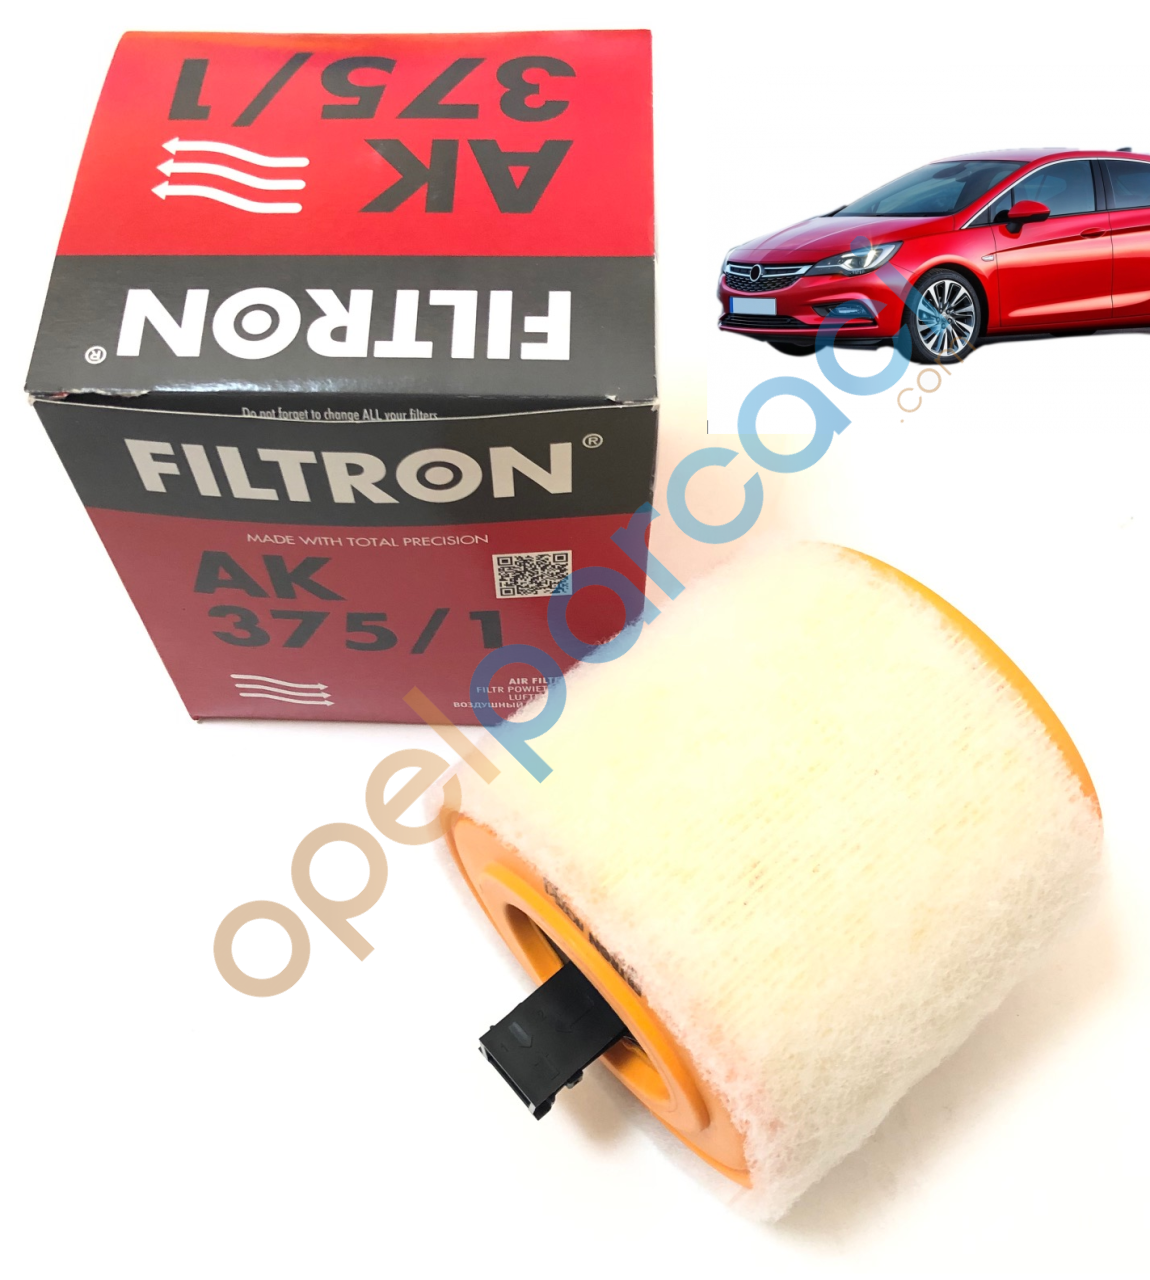 Opel Astra K Hava Filtresi Süngerli FILTRON